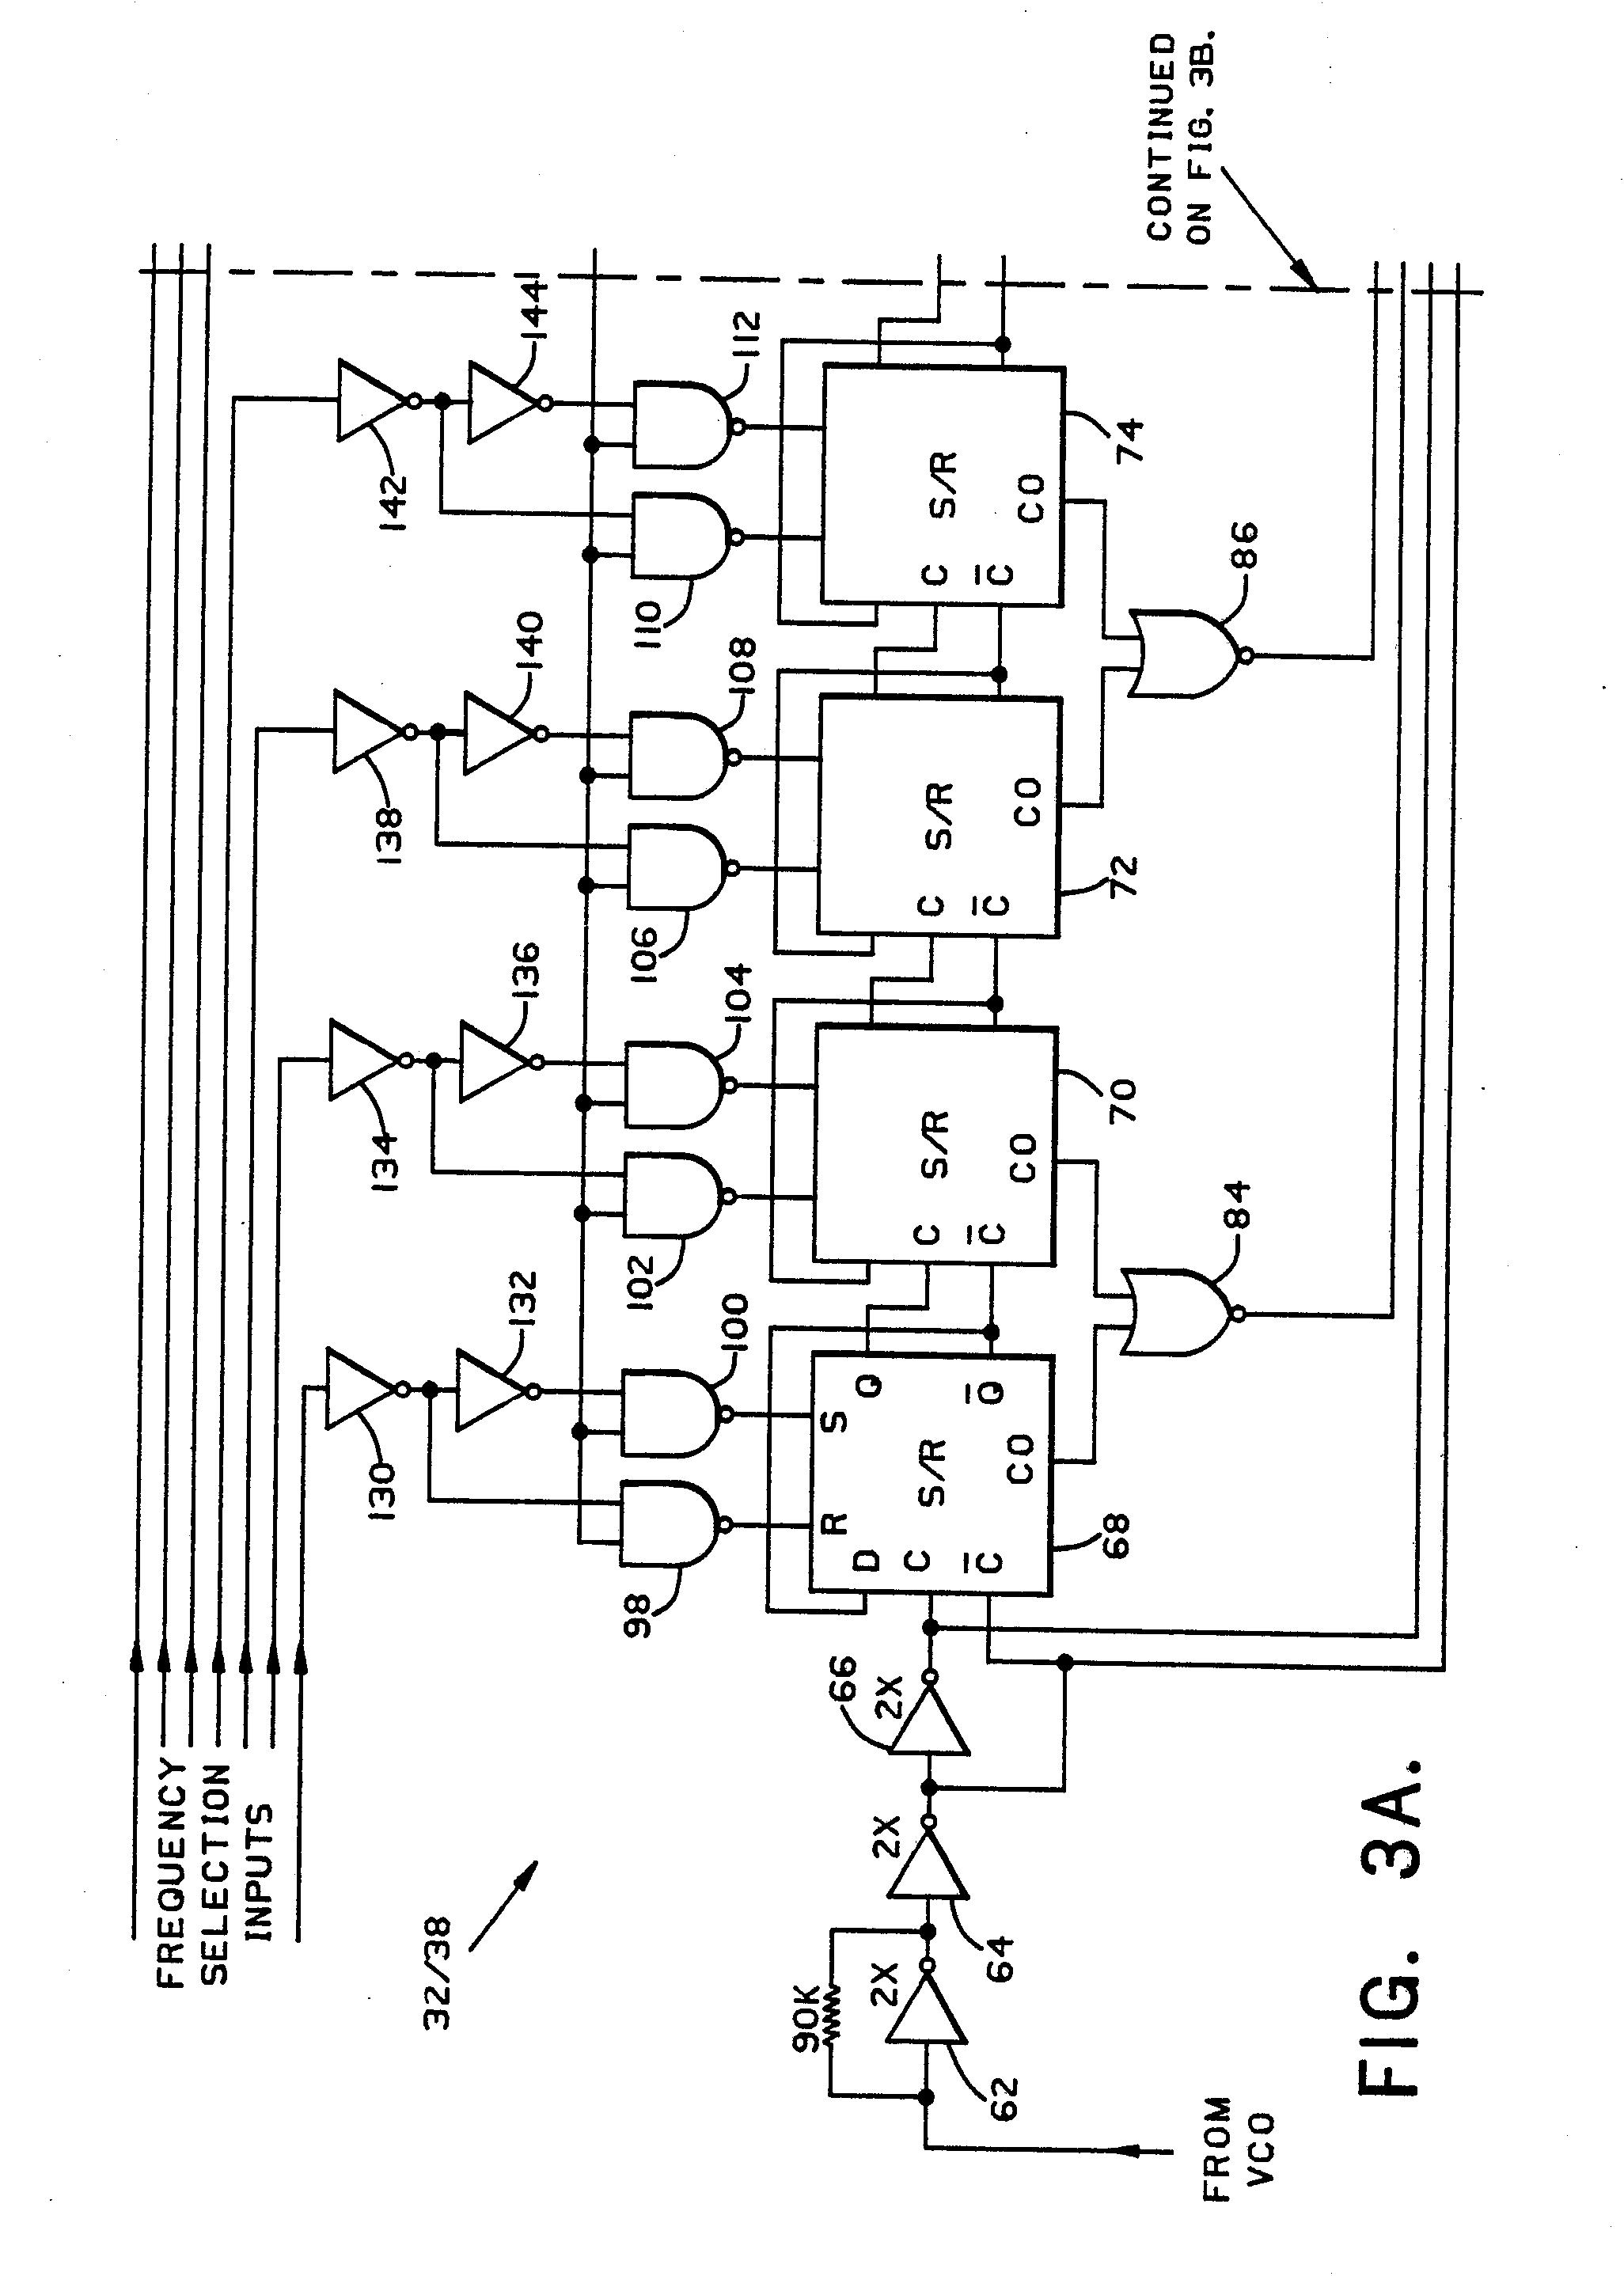 patente ep0268492a2 - a common bus multimode sensor system